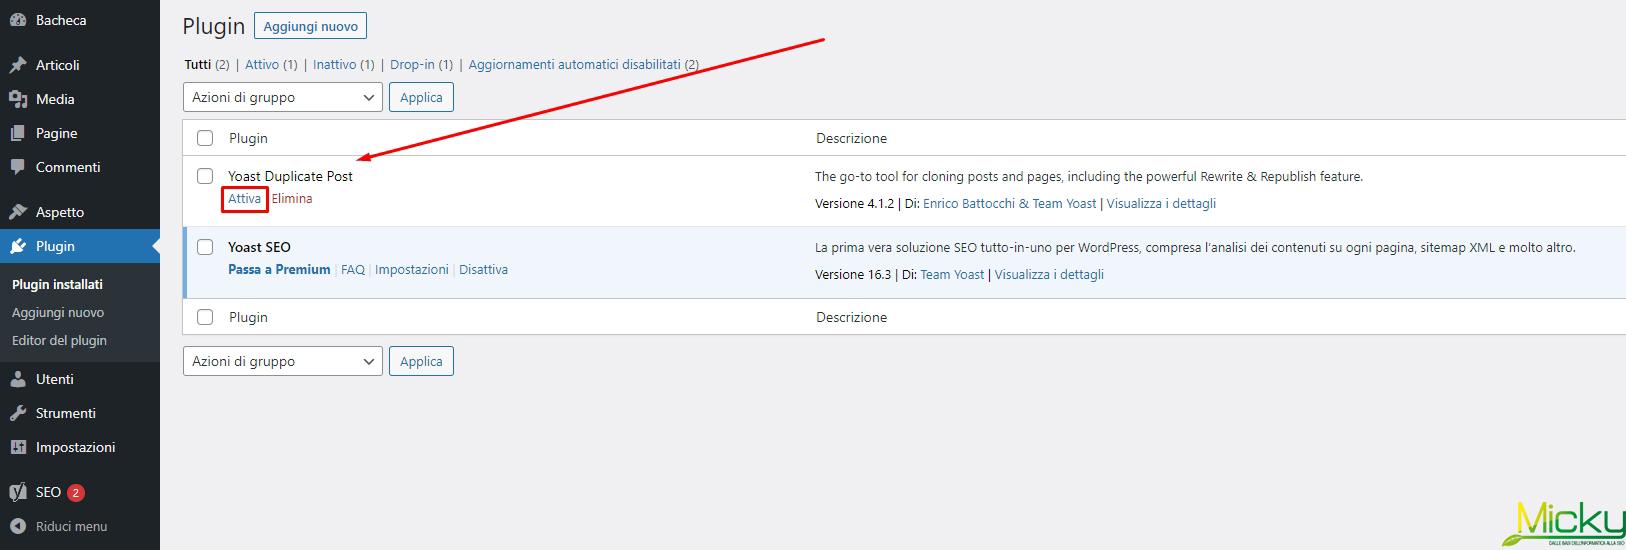 Plugin Installati WordPress